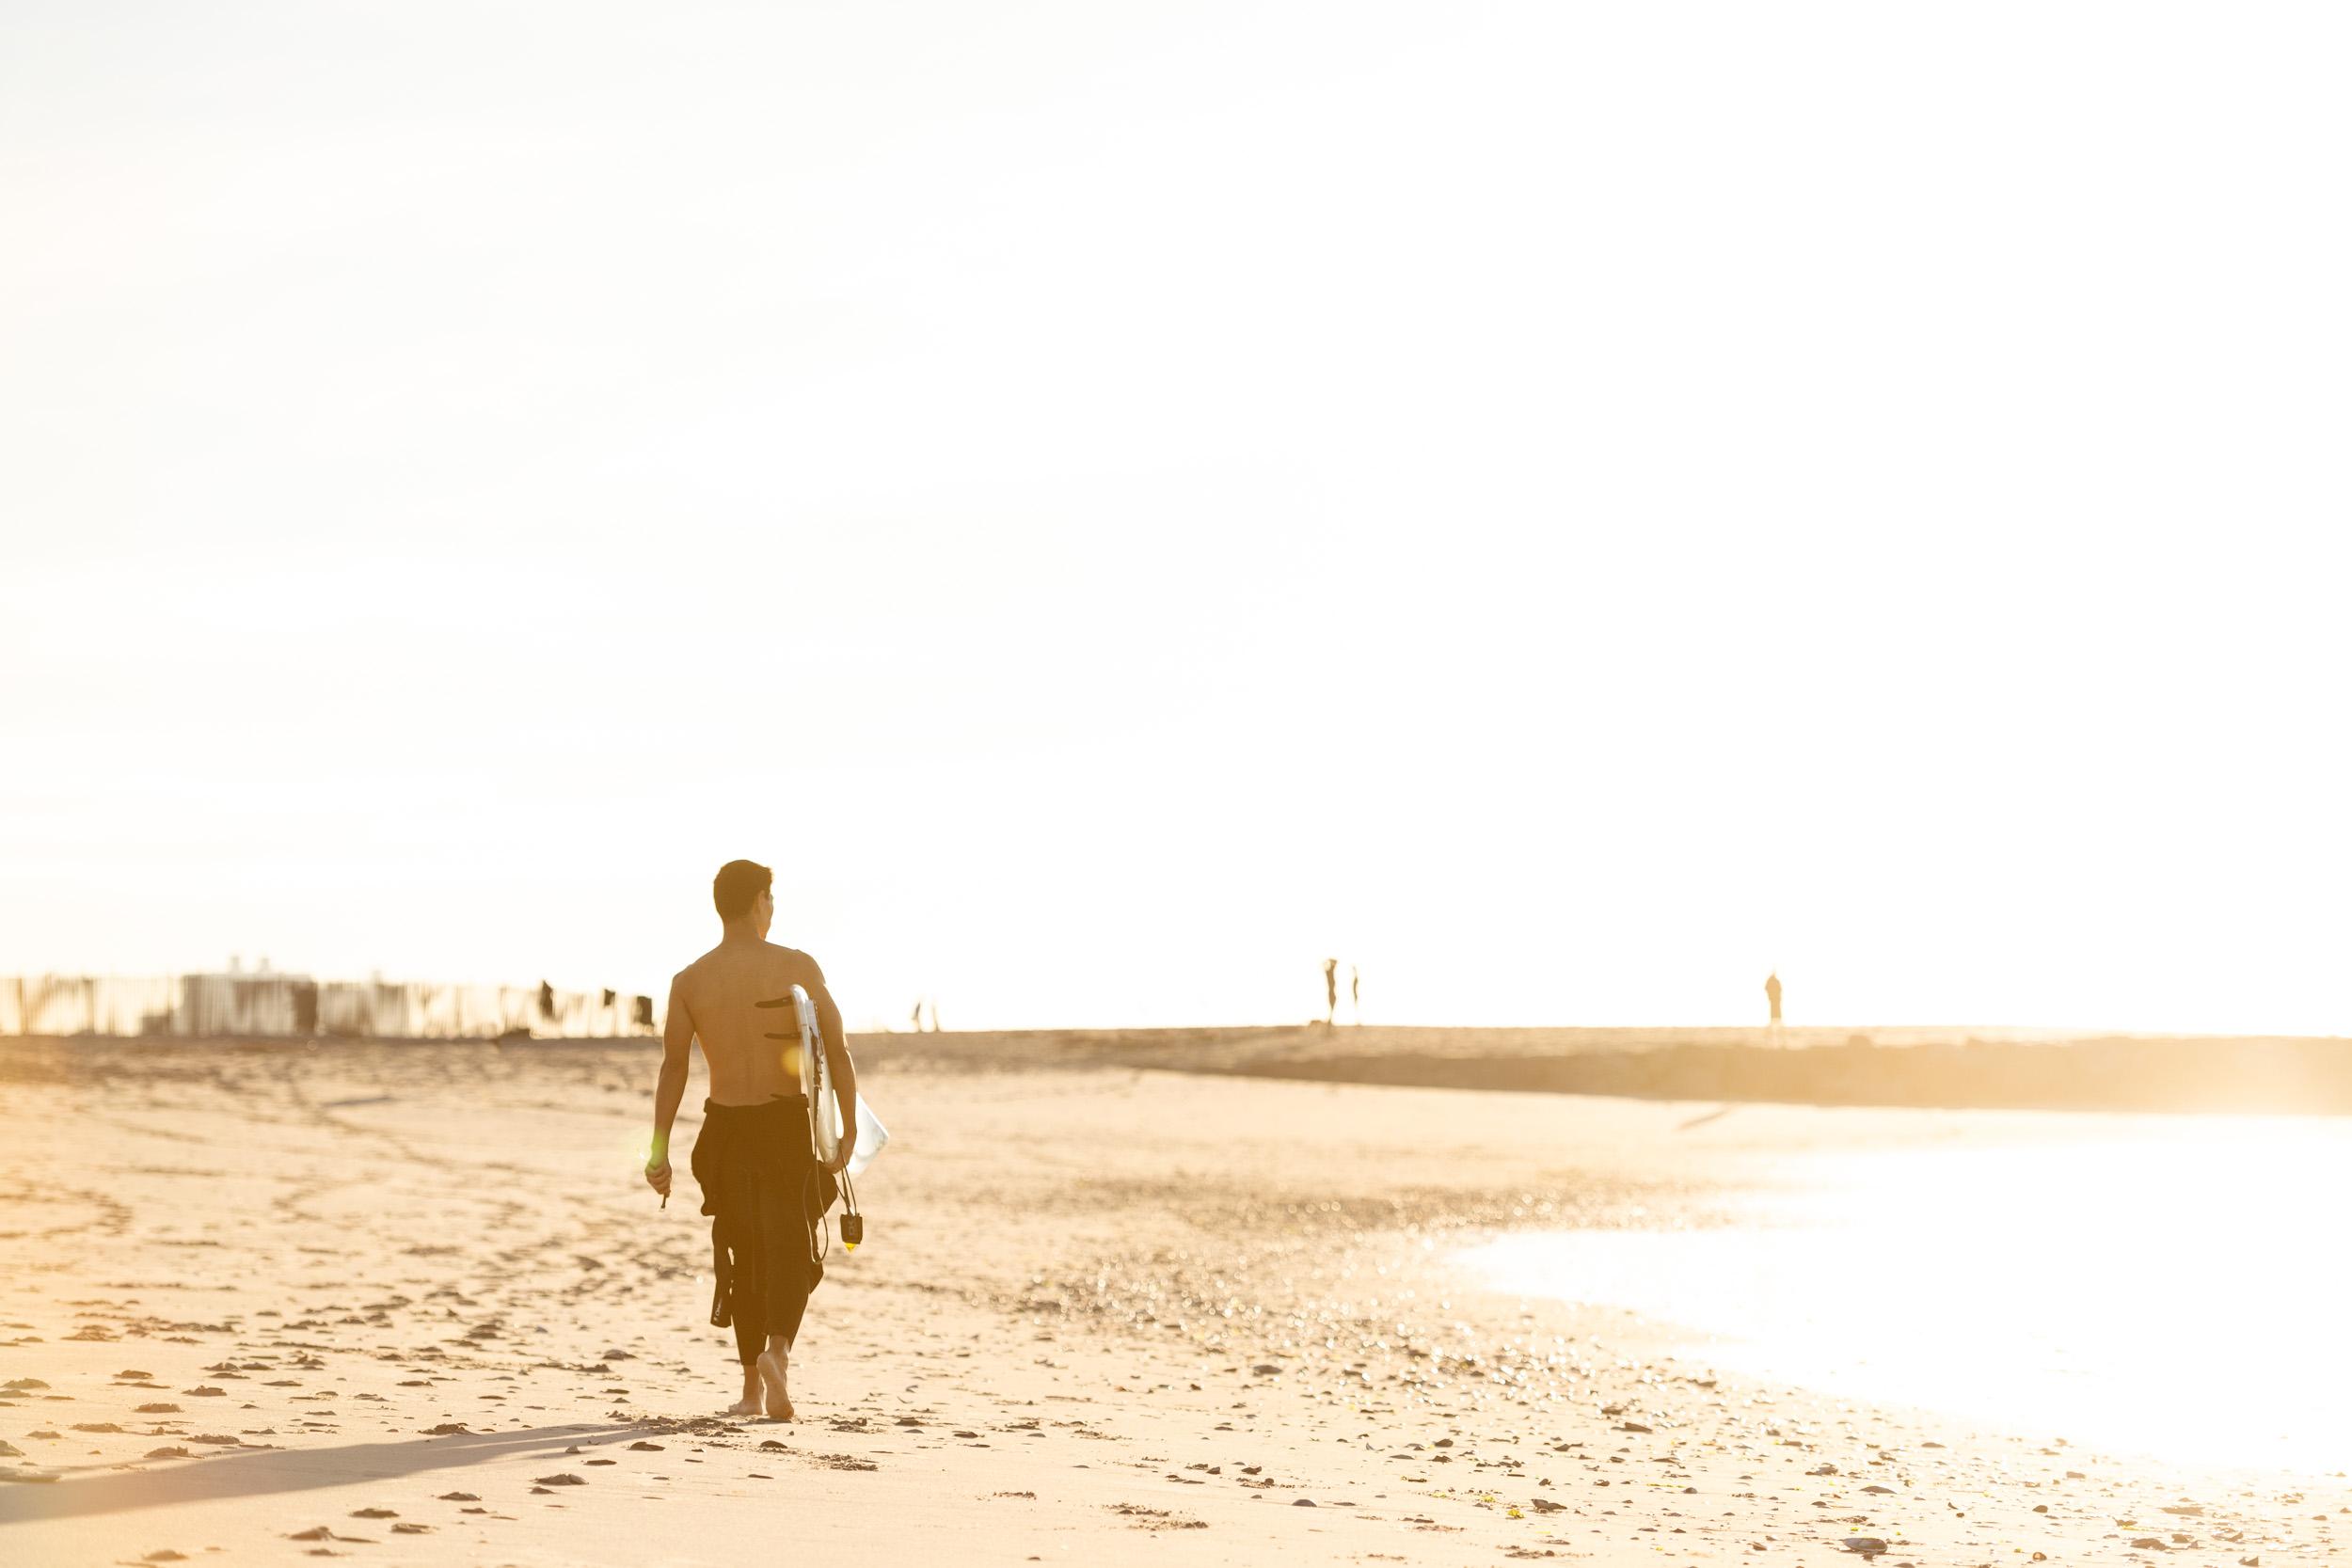 180915_Surfing Rockaway Beach_8504502-Bearbeitet.jpg